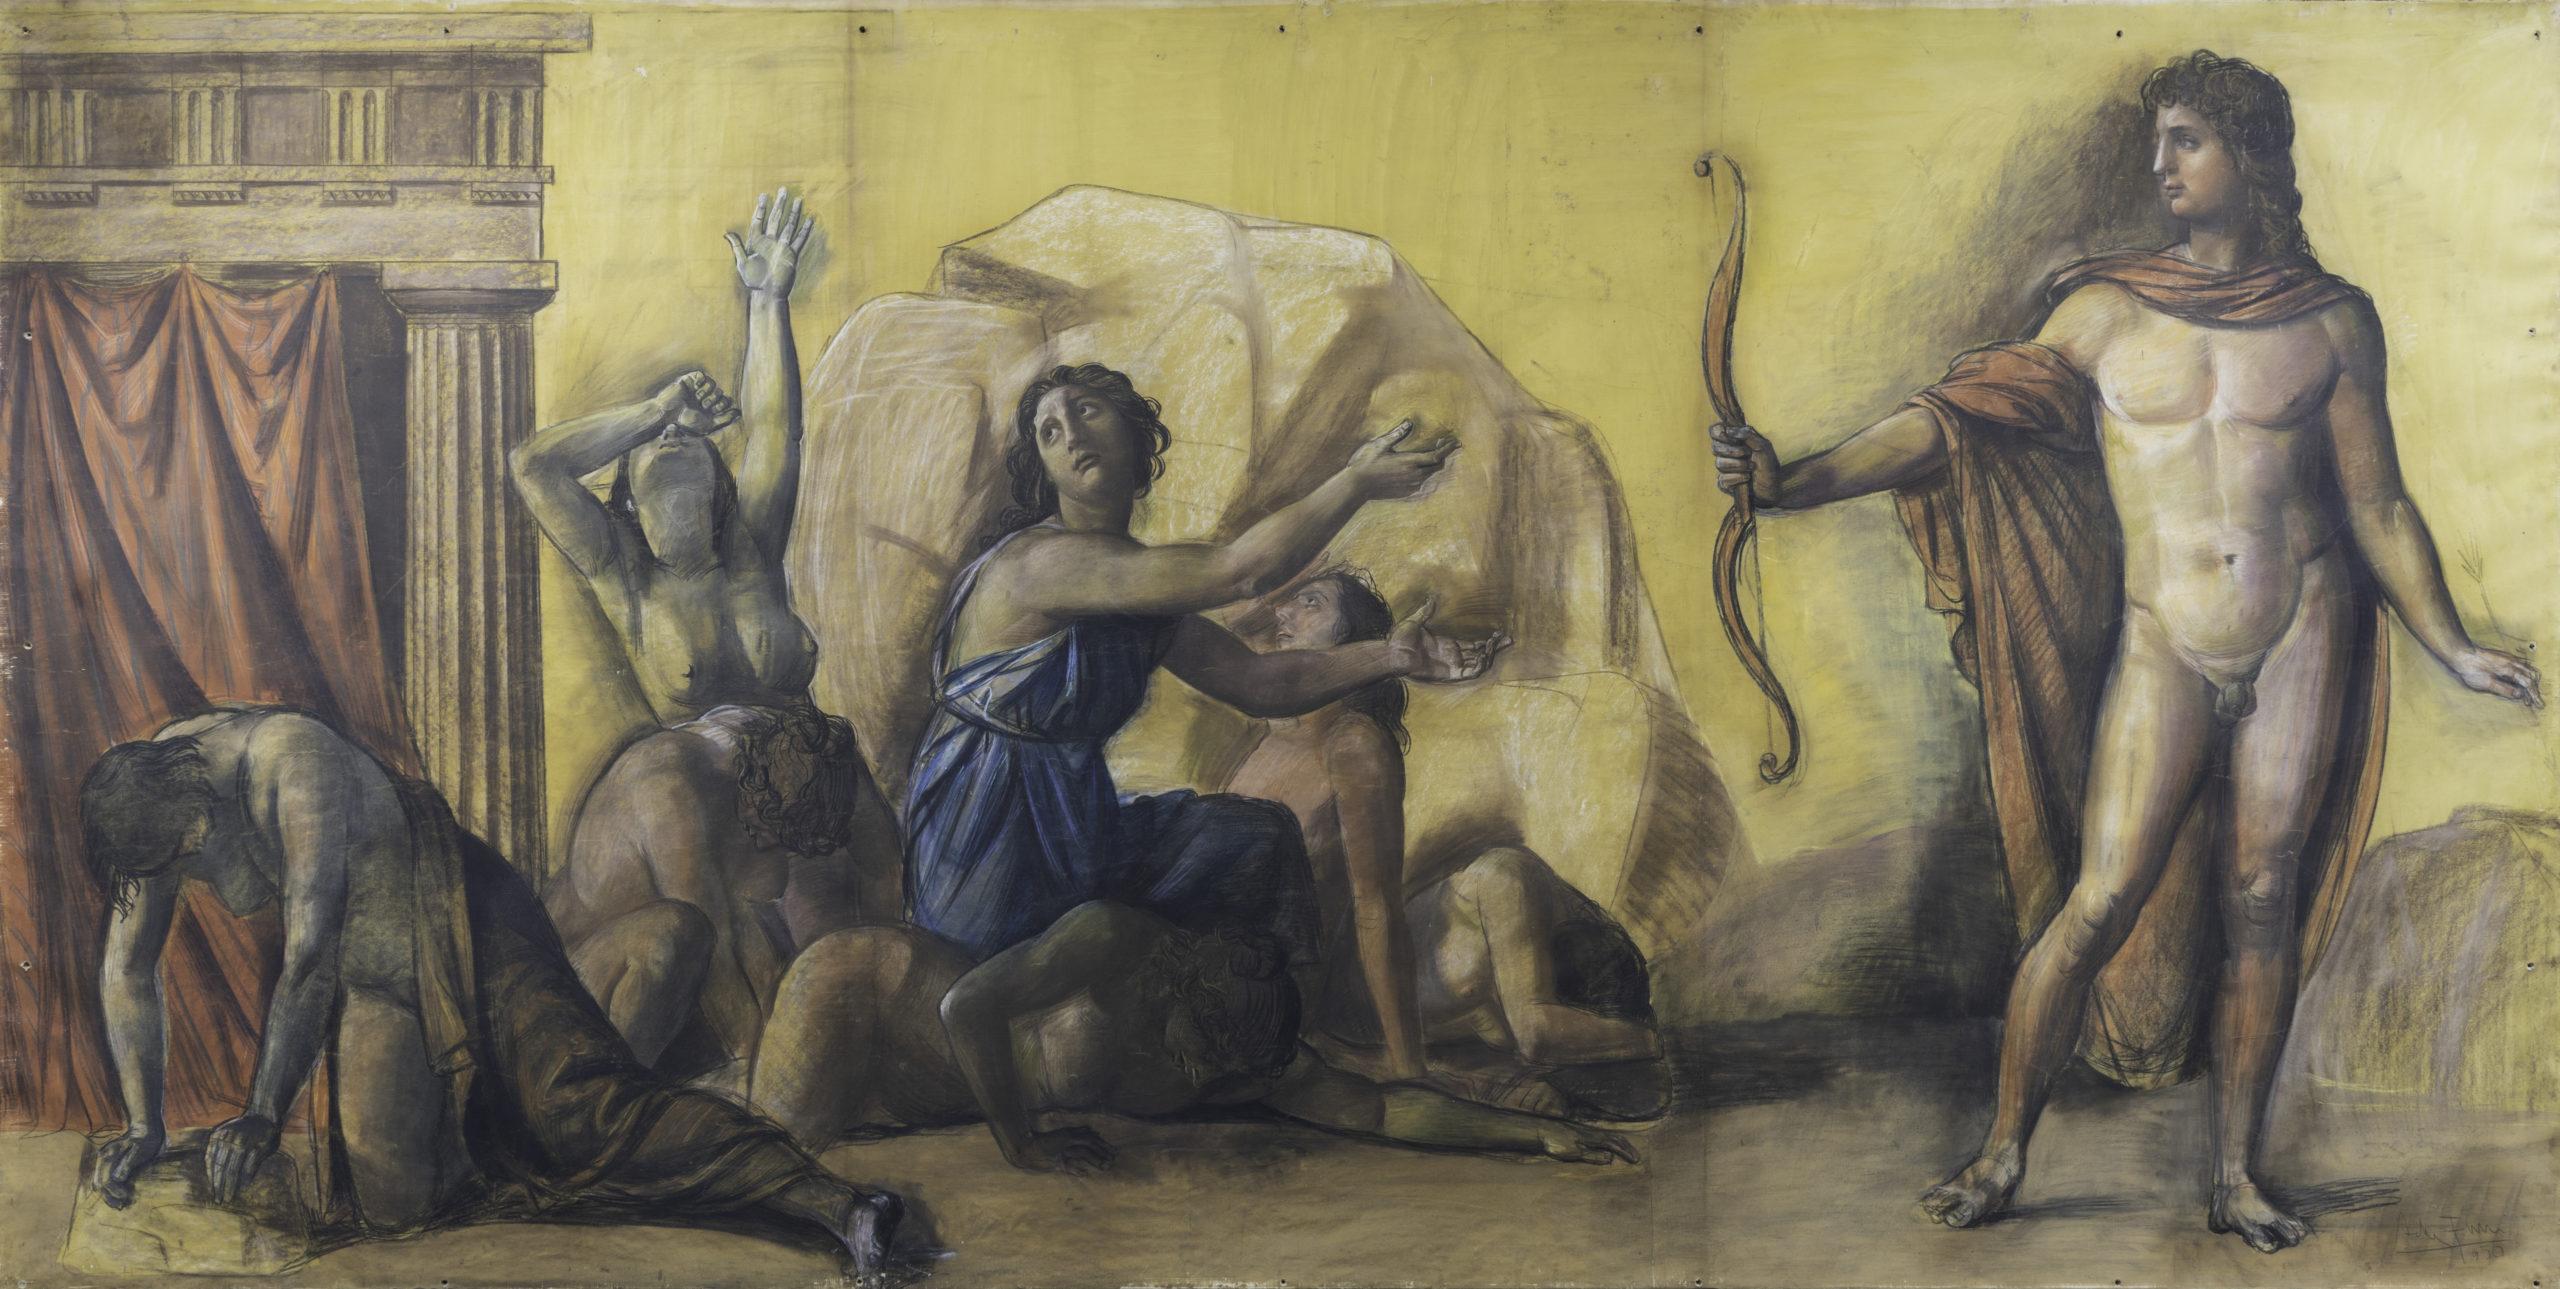 Cantore di miti. Un Achille Funi museale in asta da Cambi. Stima 30-40 mila euro